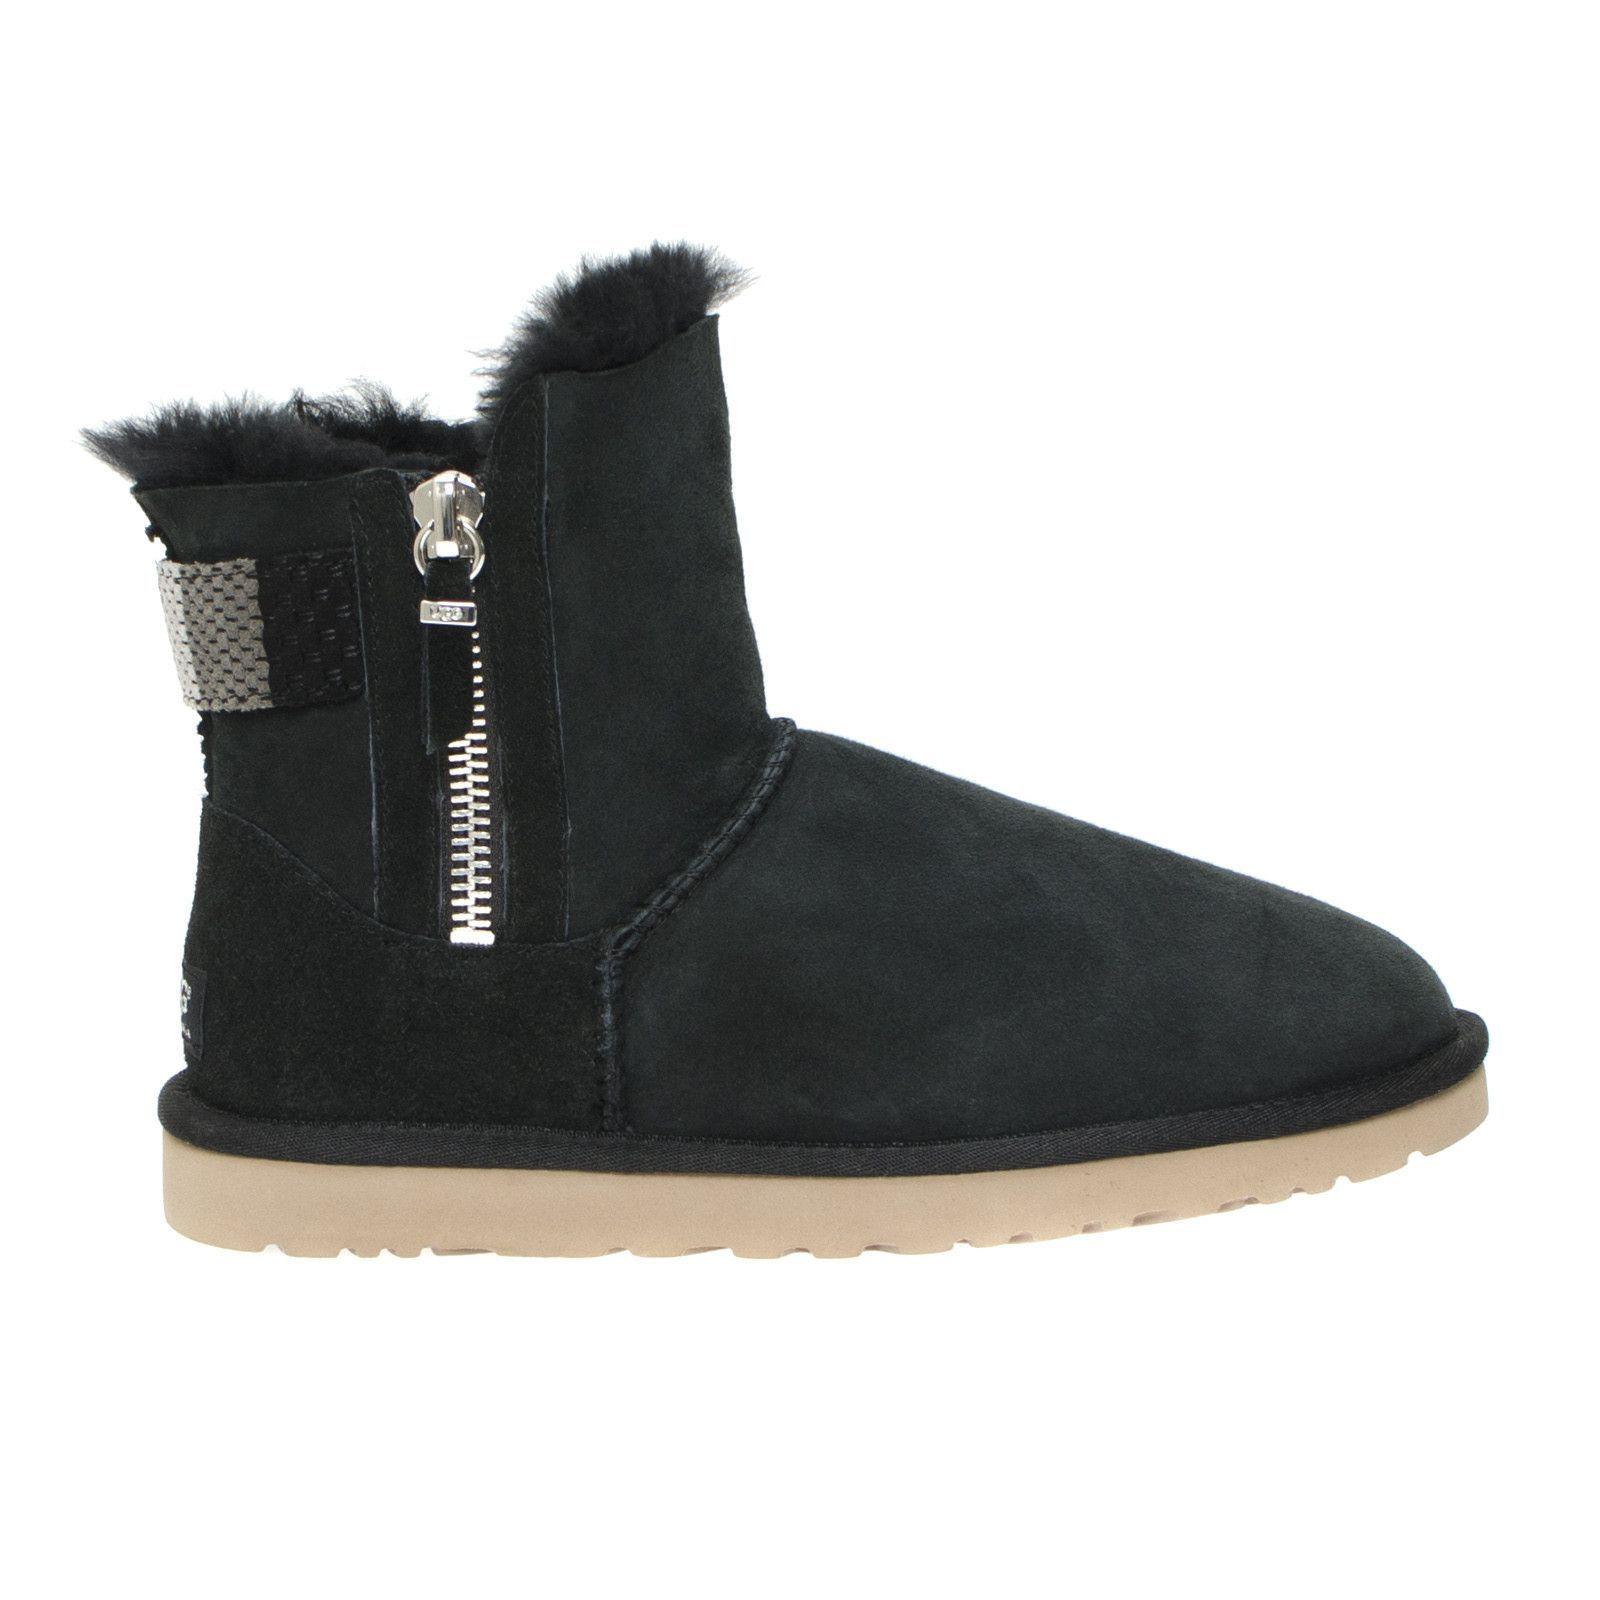 UGG AZTEK BLACK BOOTS - WOMEN'S